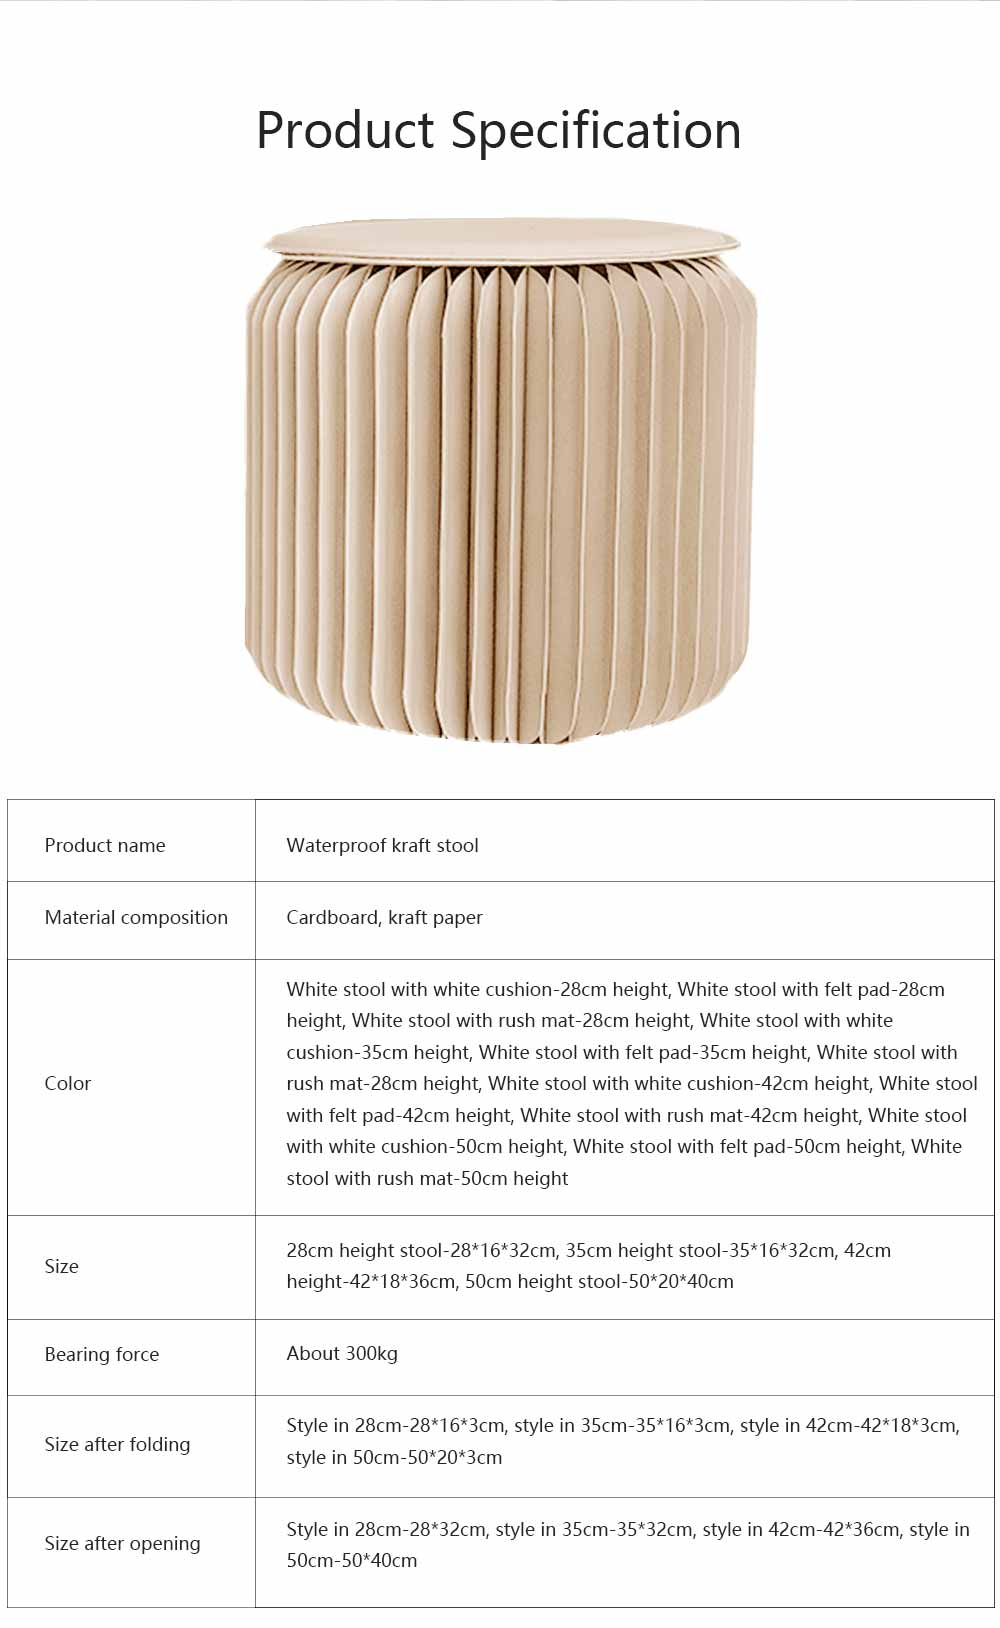 Portable Creative Folding Kraft Stool with High Load Bearing Capacity Kraft Sofa Single Stool Waterproof 7